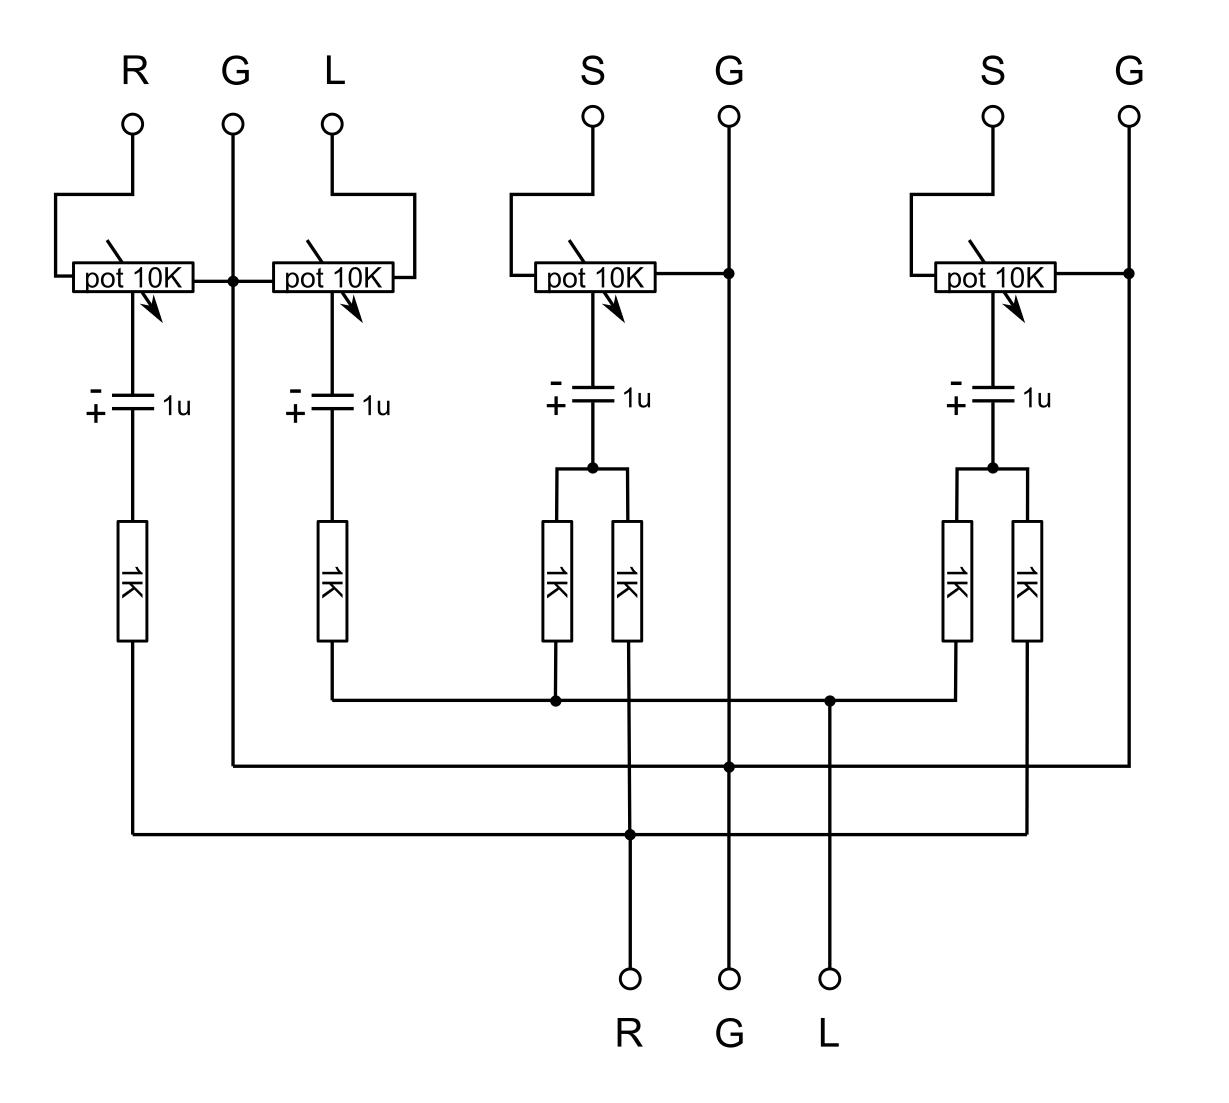 Mono Wiring Diagram Cyclic Photophosphorylation Therandomlab Simple Passive Stereo To Audio